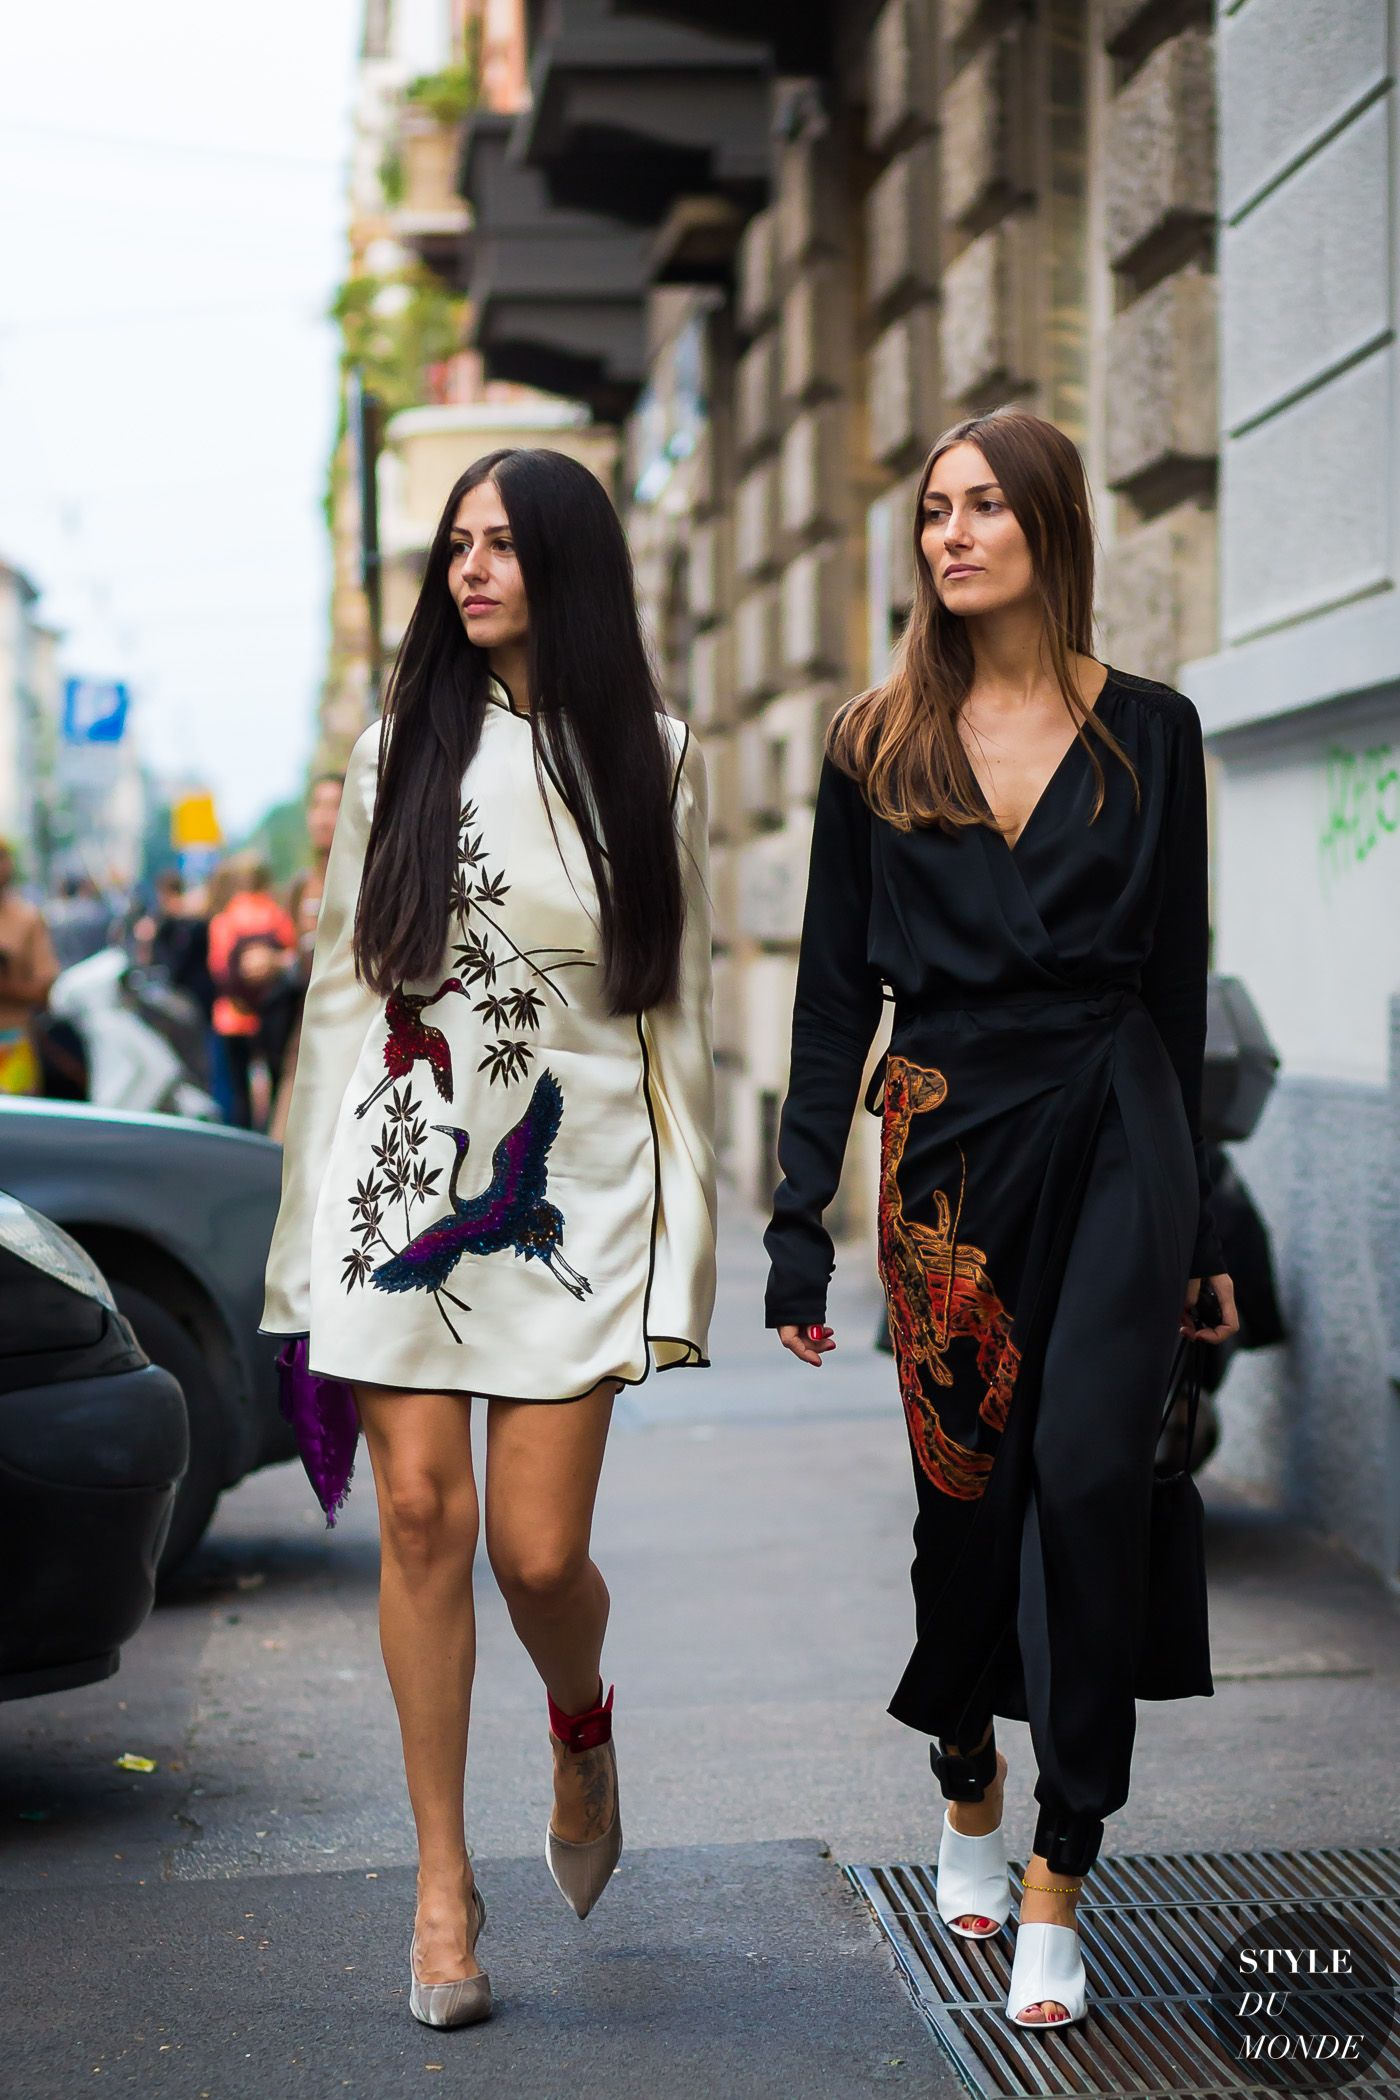 aad0d19a91 gilda-ambrosio-and-giorgia-tordini -by-styledumonde-street-style-fashion-photography